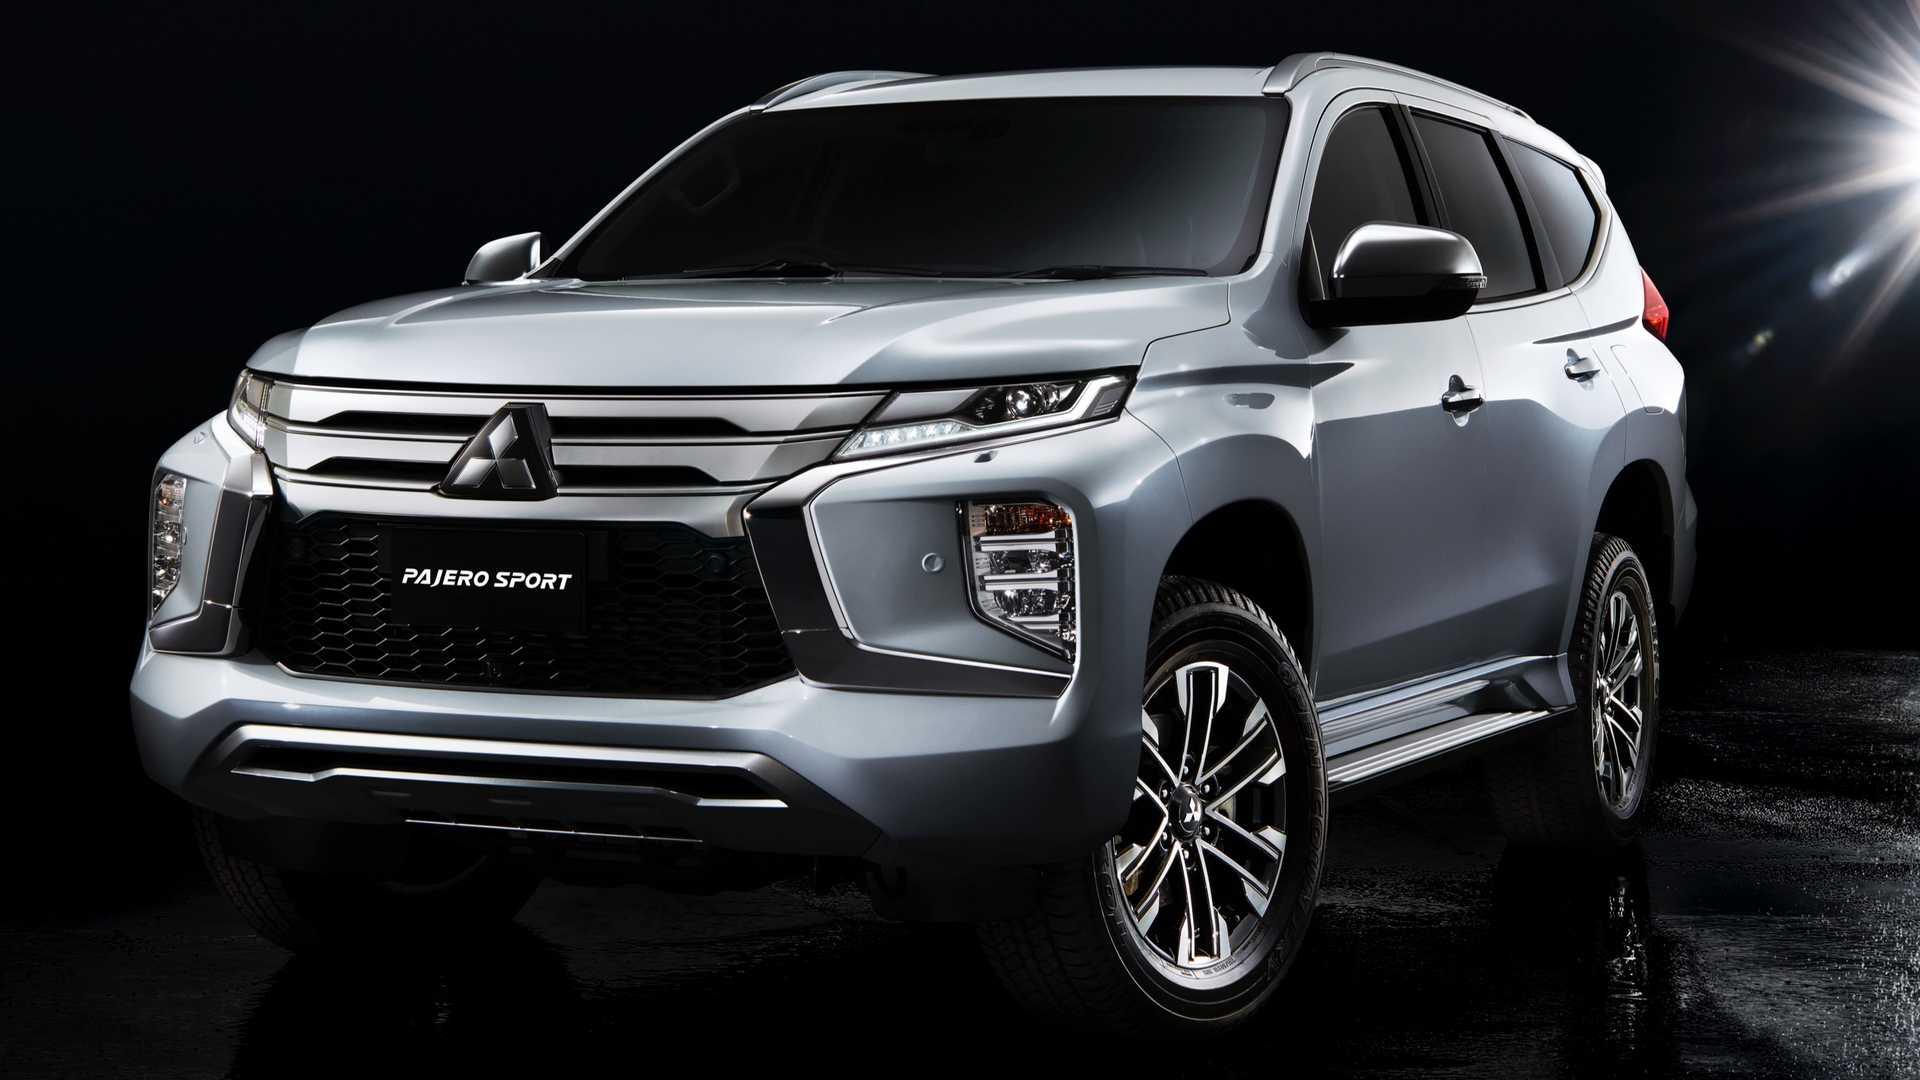 20 Great Mitsubishi Pajero Wagon 2020 Release Date for Mitsubishi Pajero Wagon 2020